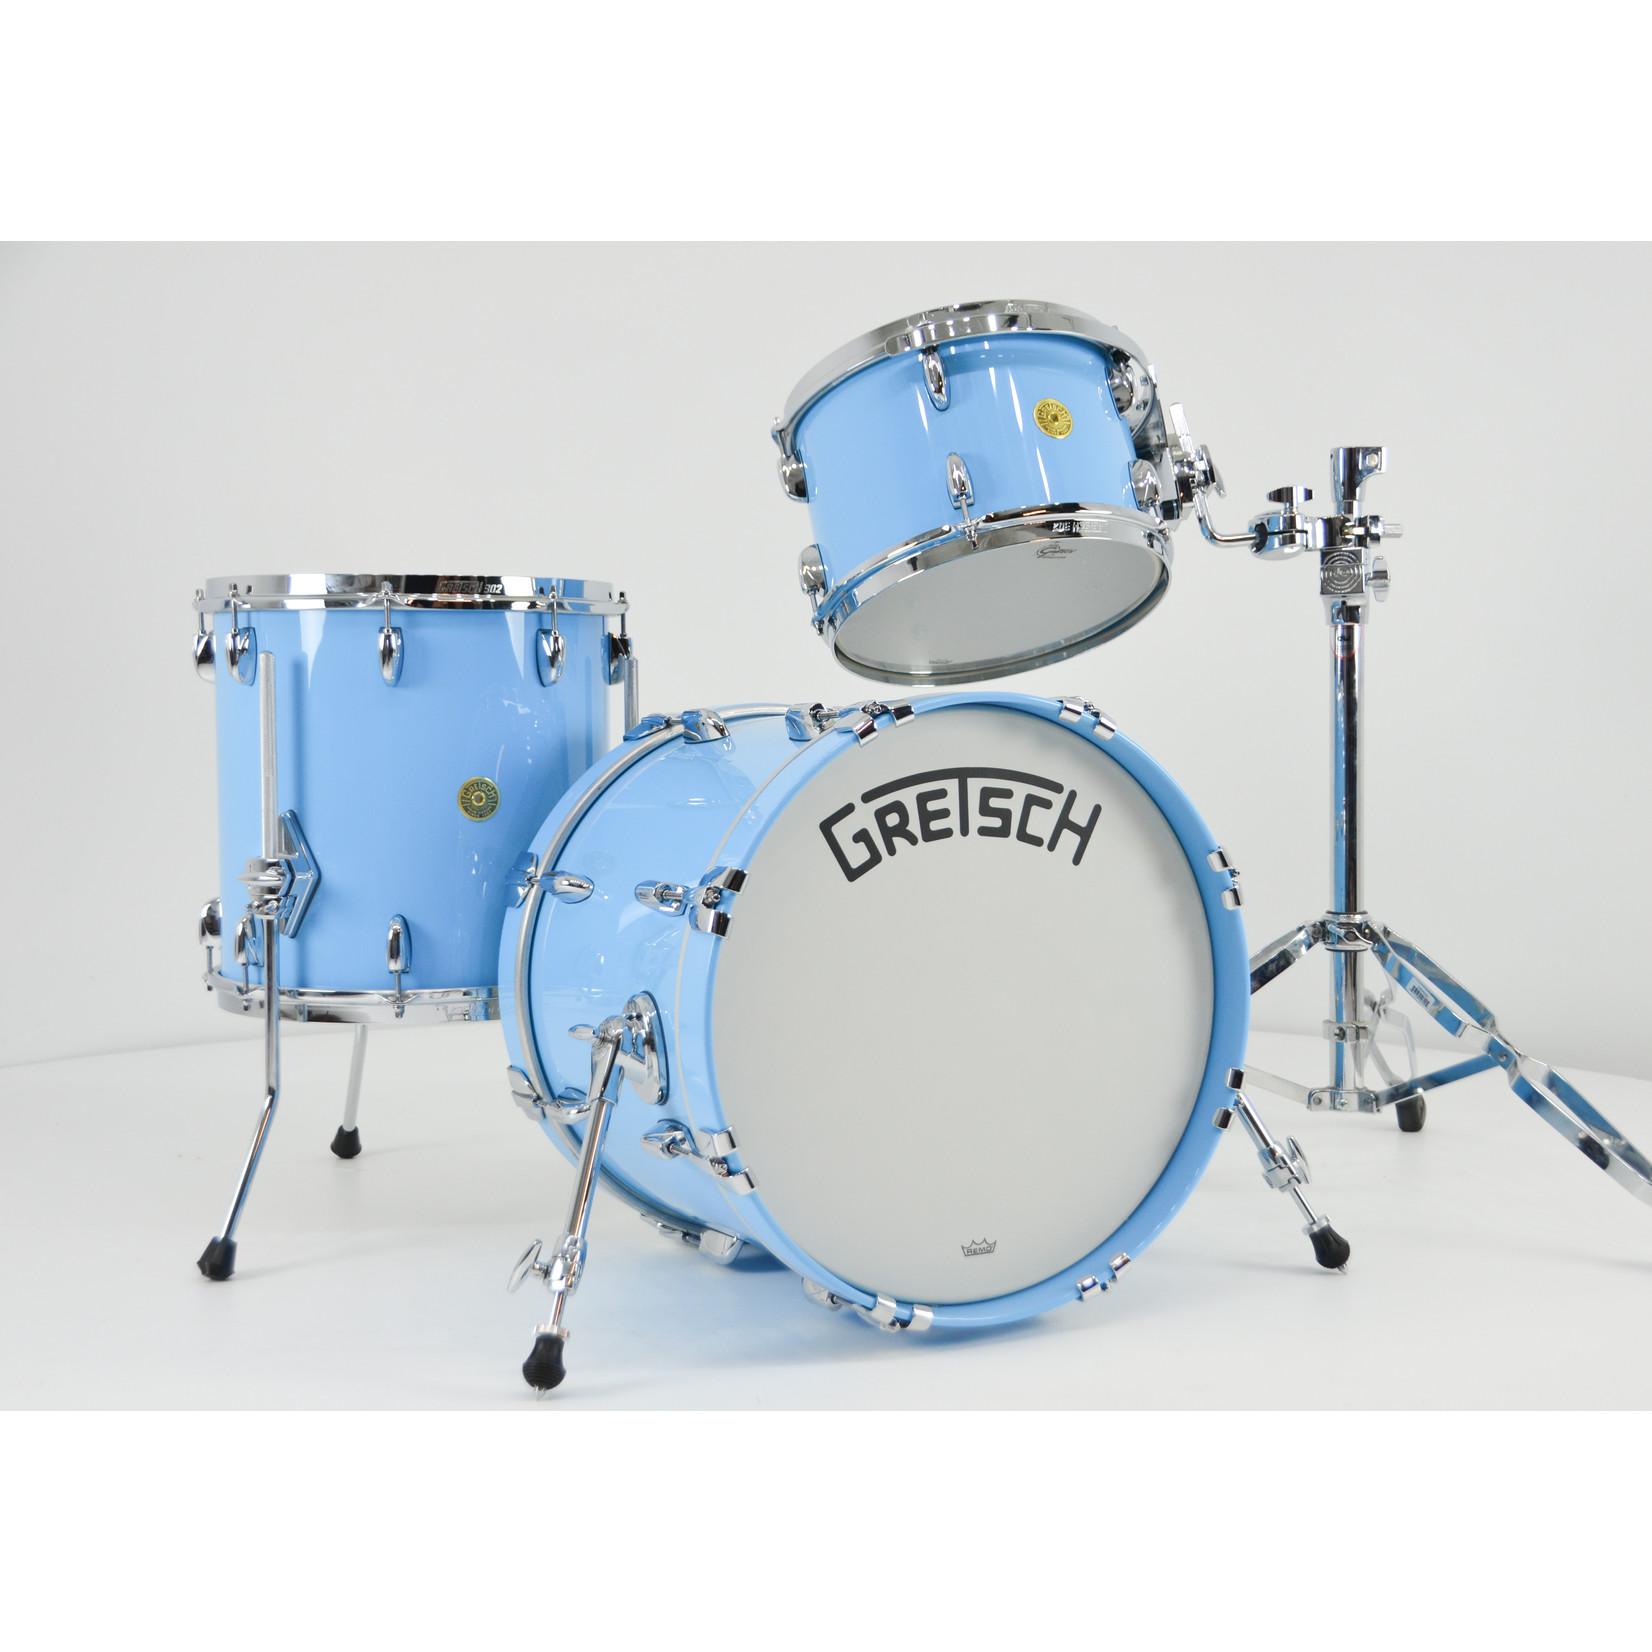 "Gretsch Gretsch Broadkaster 3pc Drum Kit ""Powder Blue Gloss Lacquer"""